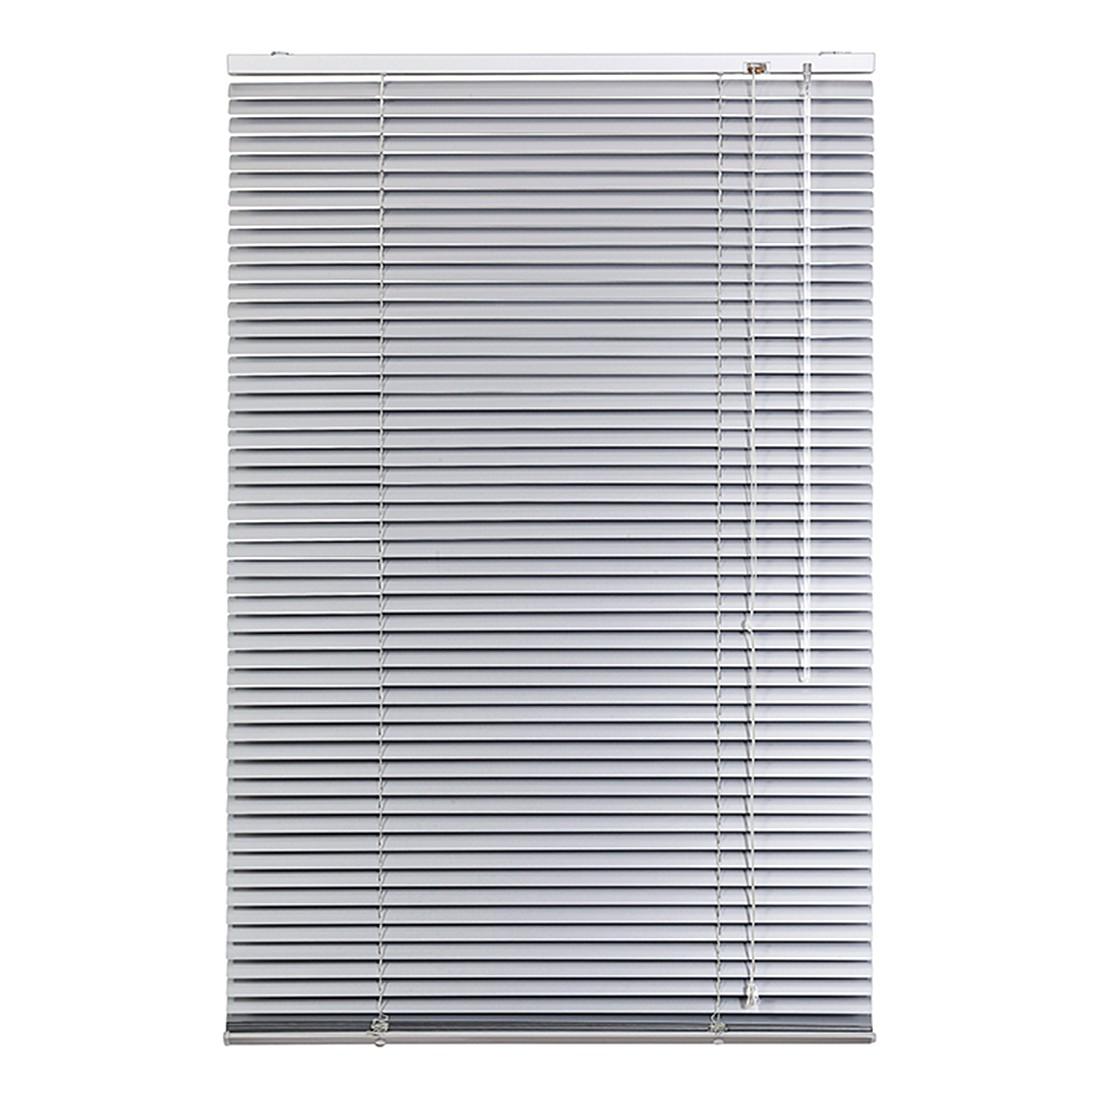 Jalousie Klemmfix – Aluminium, Silber – (H x B): 60 x 40 cm, Wohn-Guide günstig online kaufen